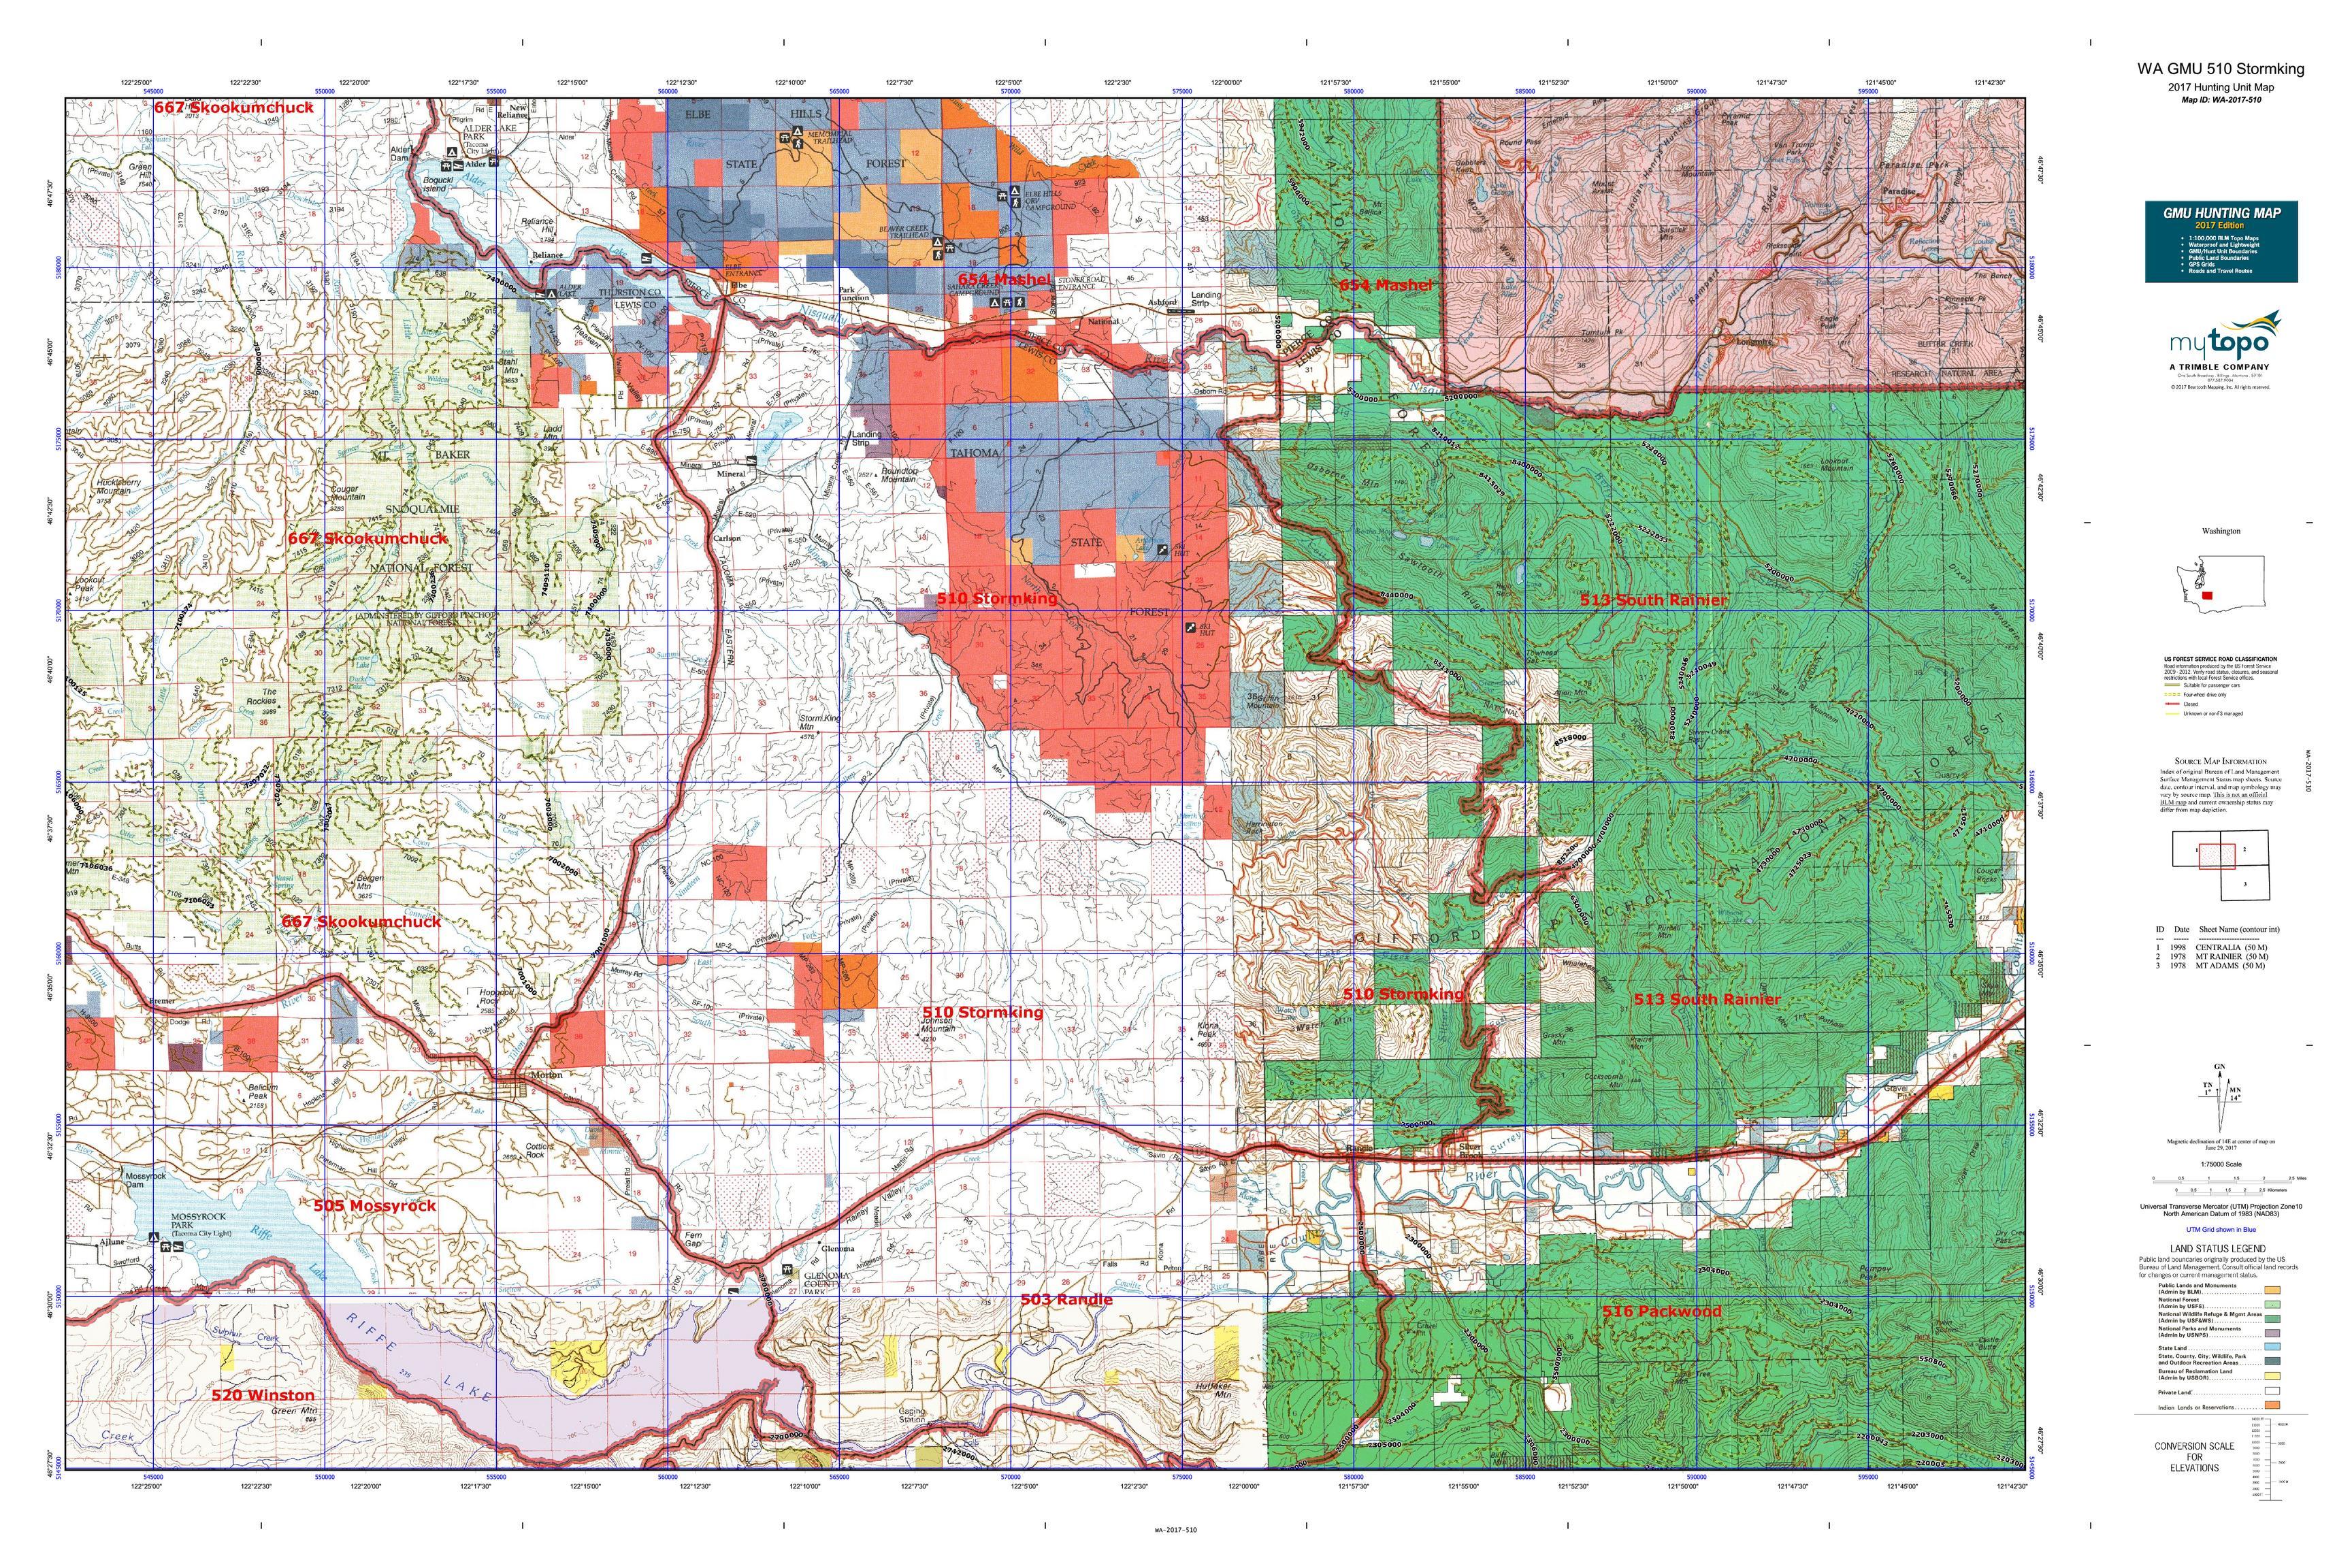 WA GMU 510 Stormking Map